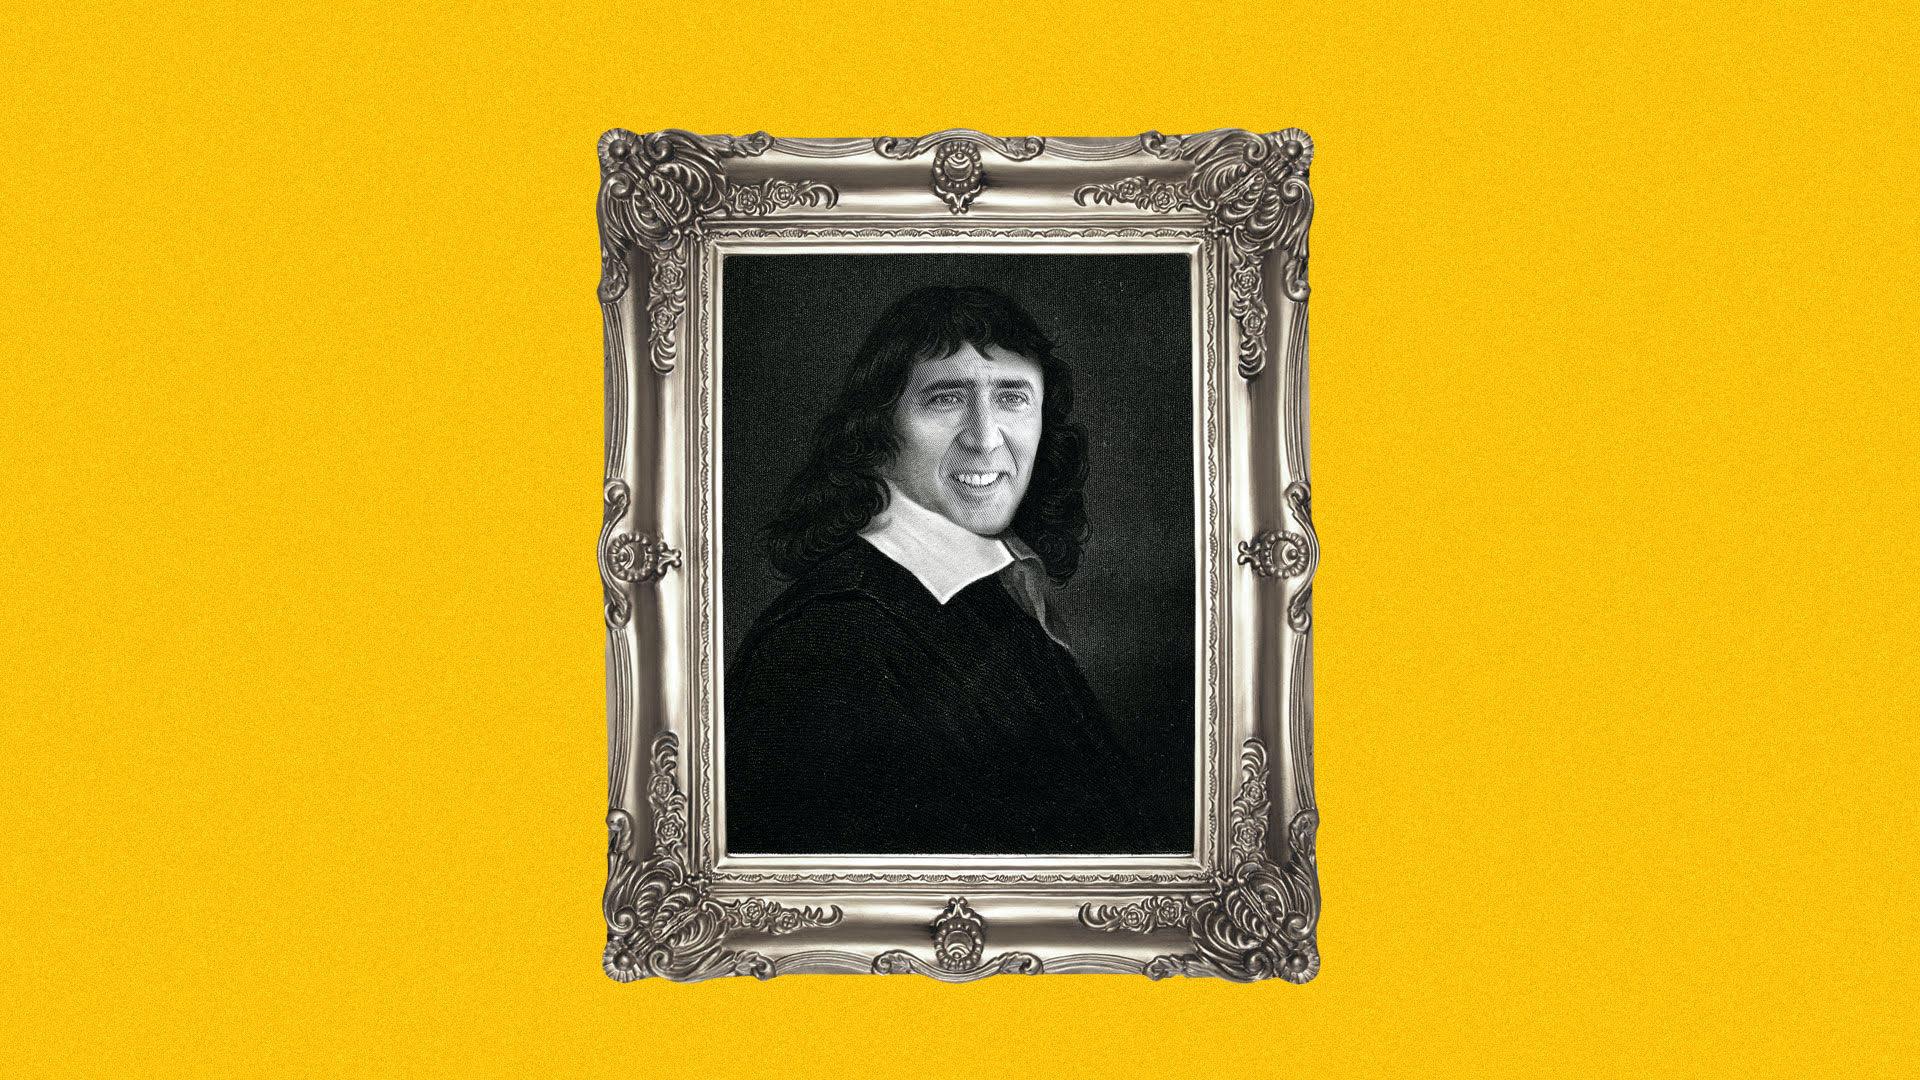 Illustration of a framed portrait of Renée Descartes with Nicholas Cage's face